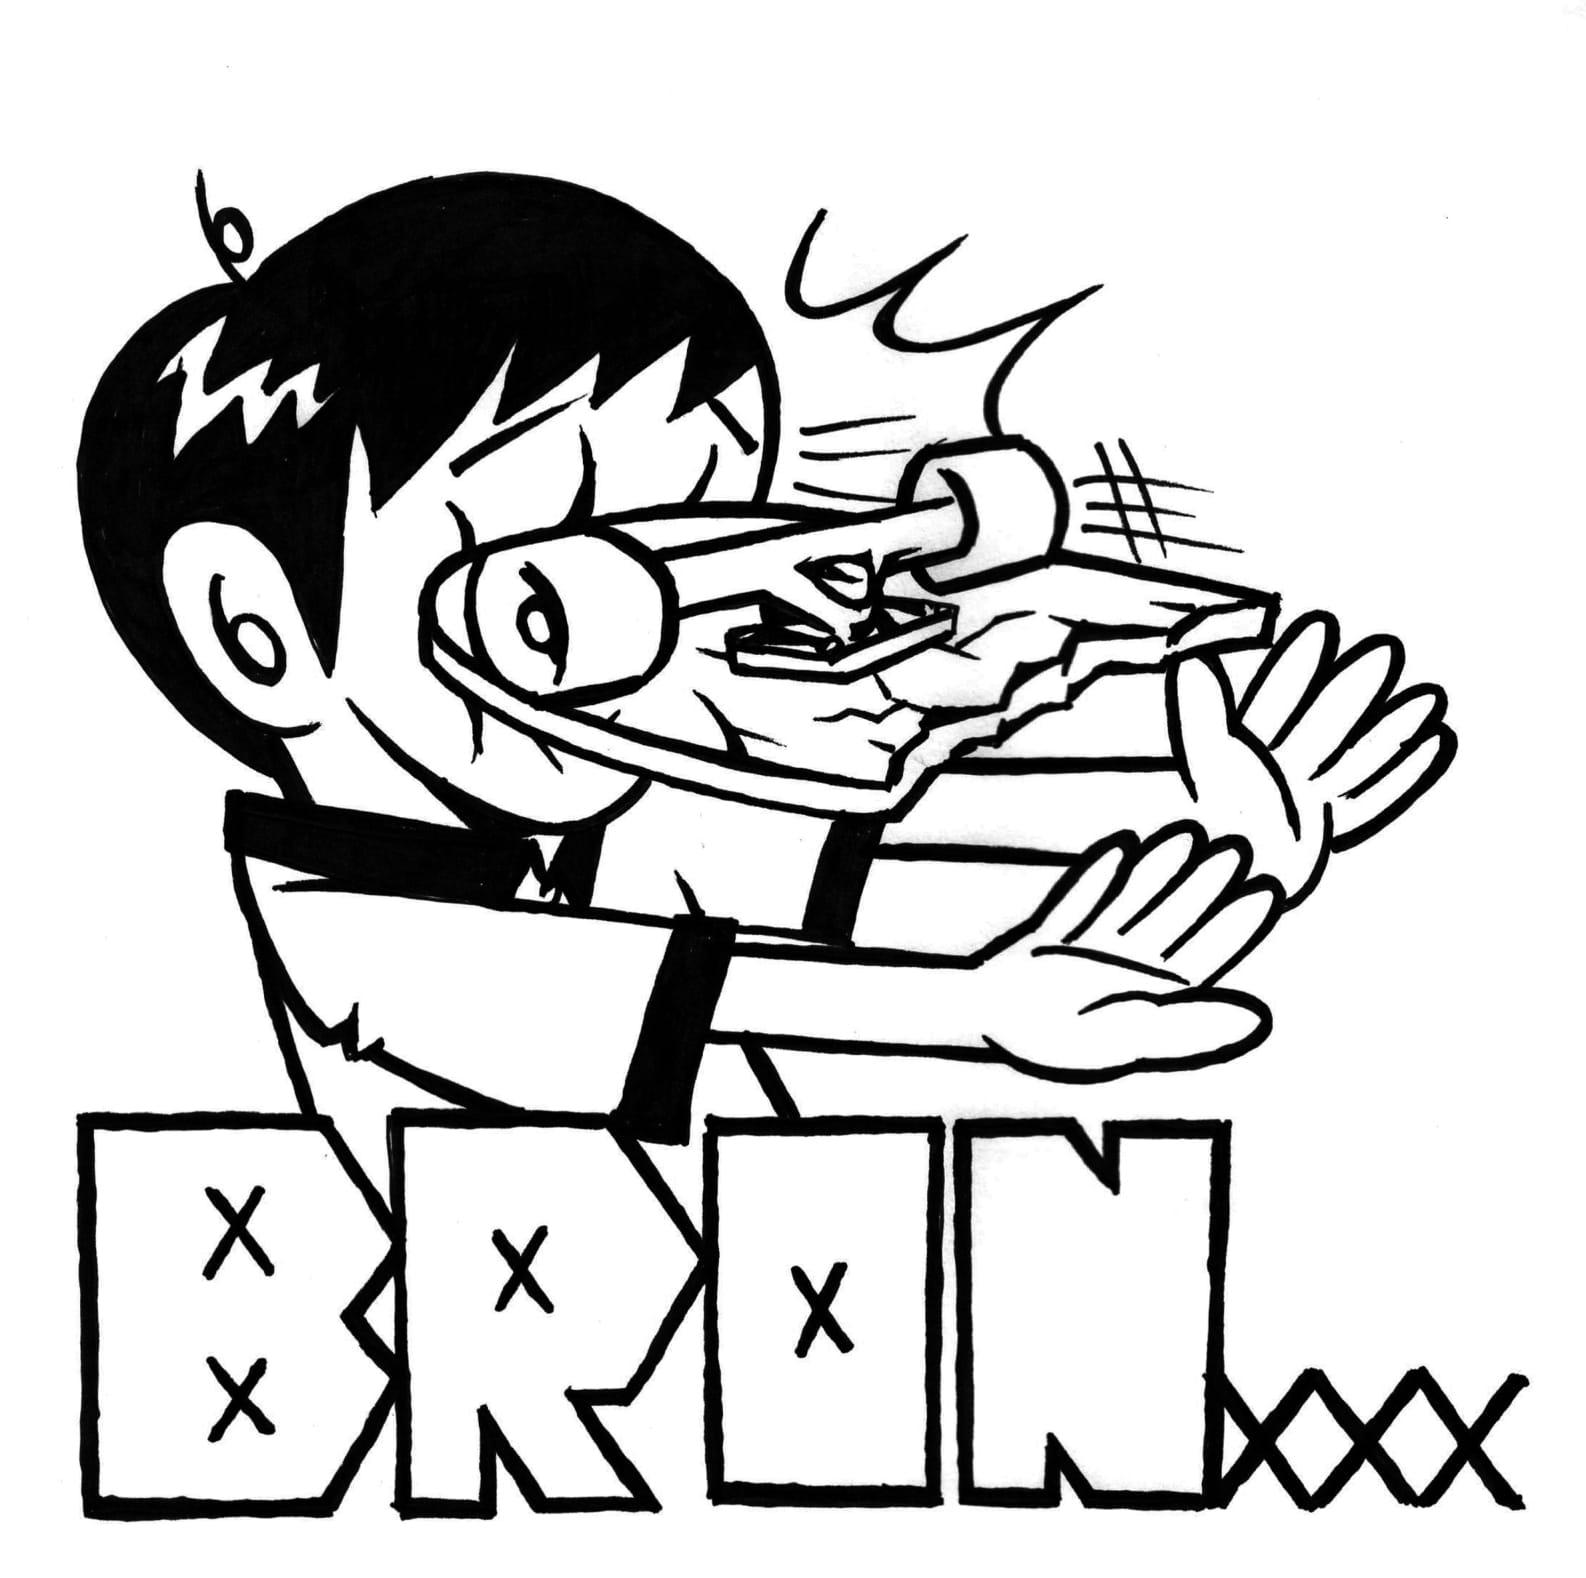 BRONxxx online store